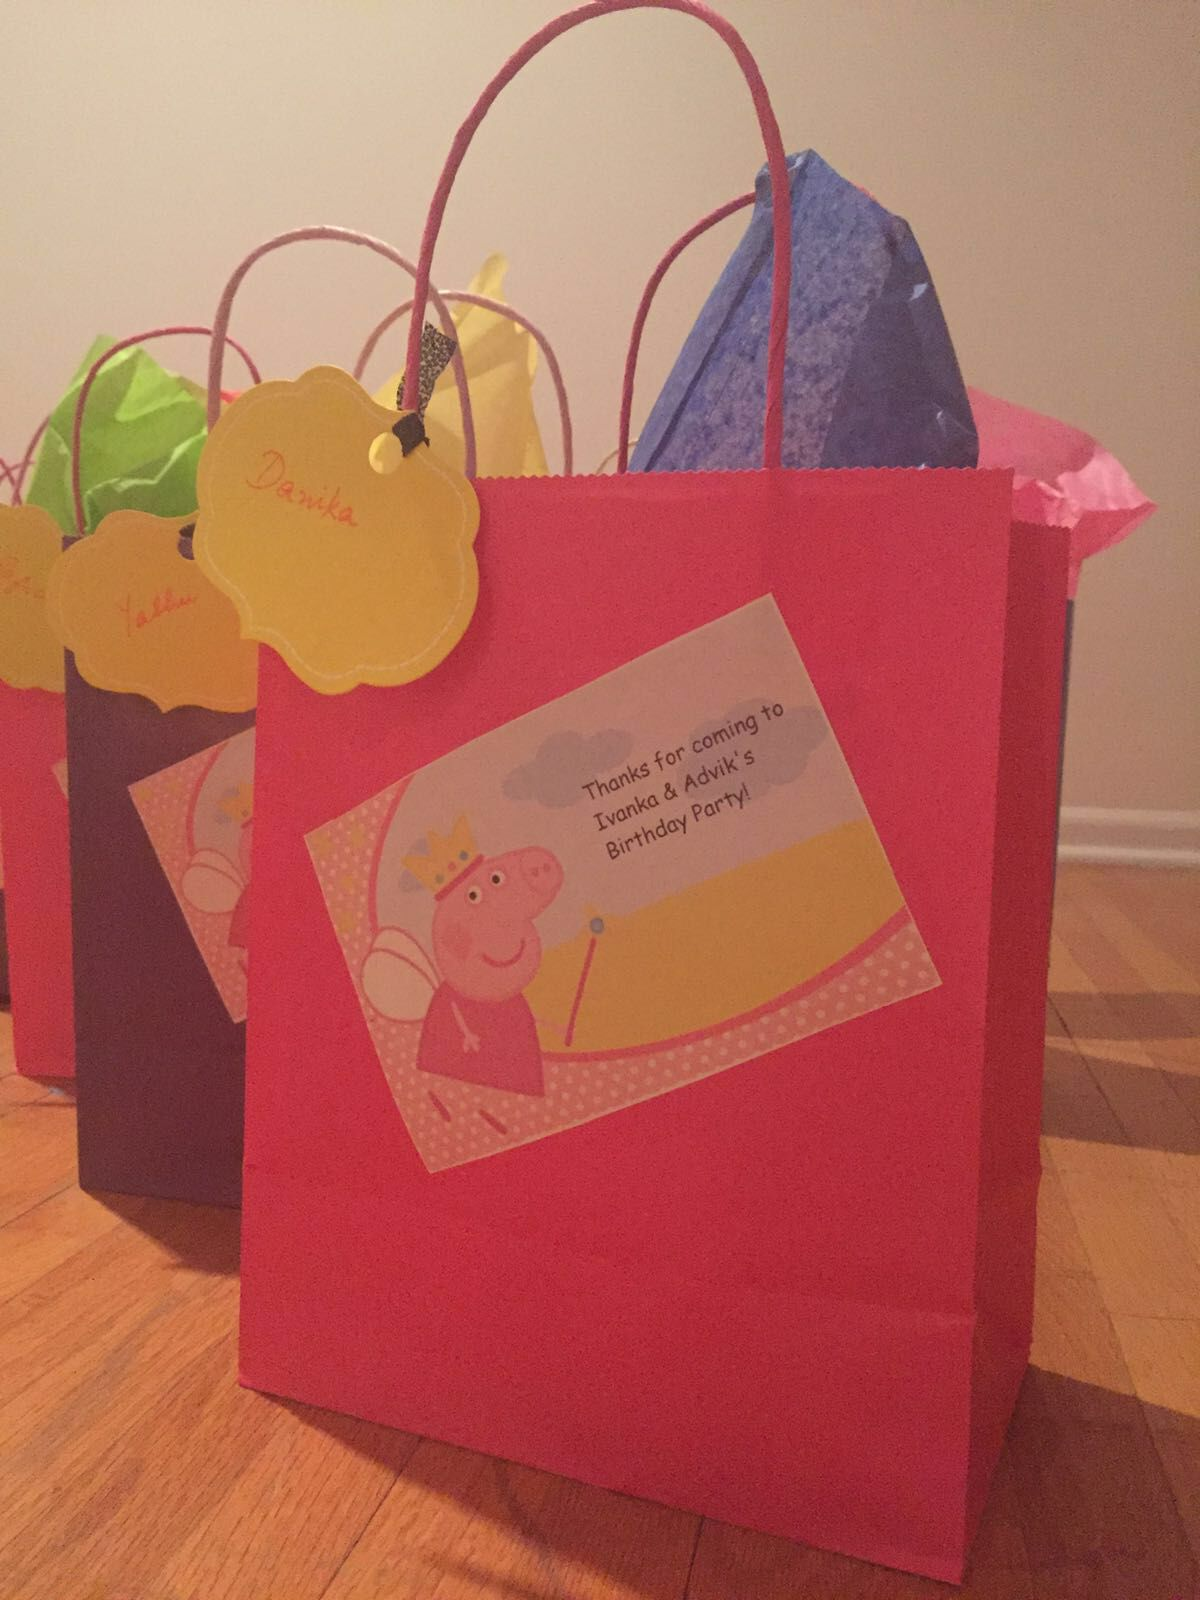 Peppapig Return Gift Bag Baby Birthday Decorations Celebration Paper Shopping